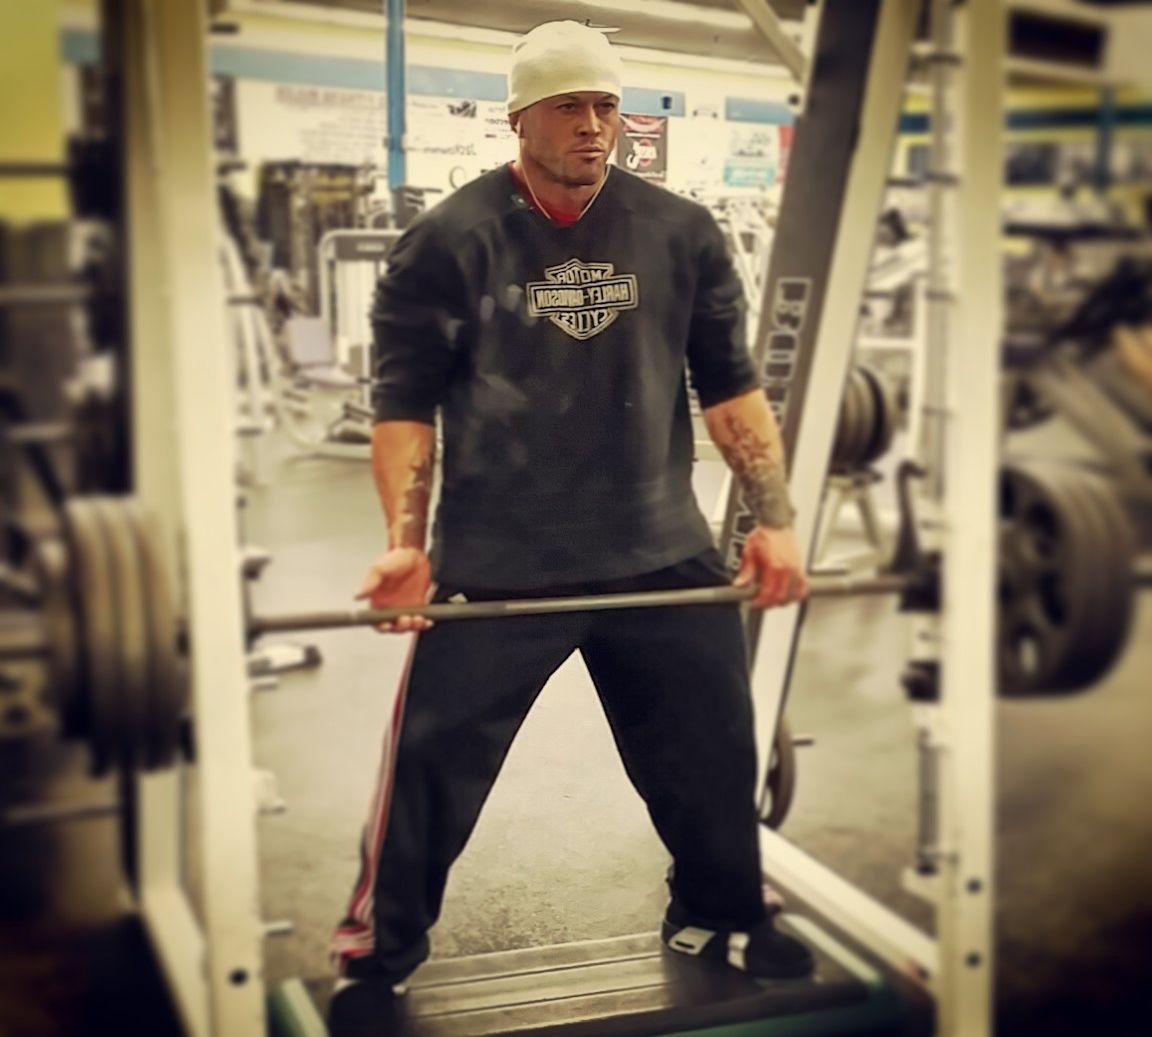 Tattooed Physique Model John Quinlan Gym Training 14'